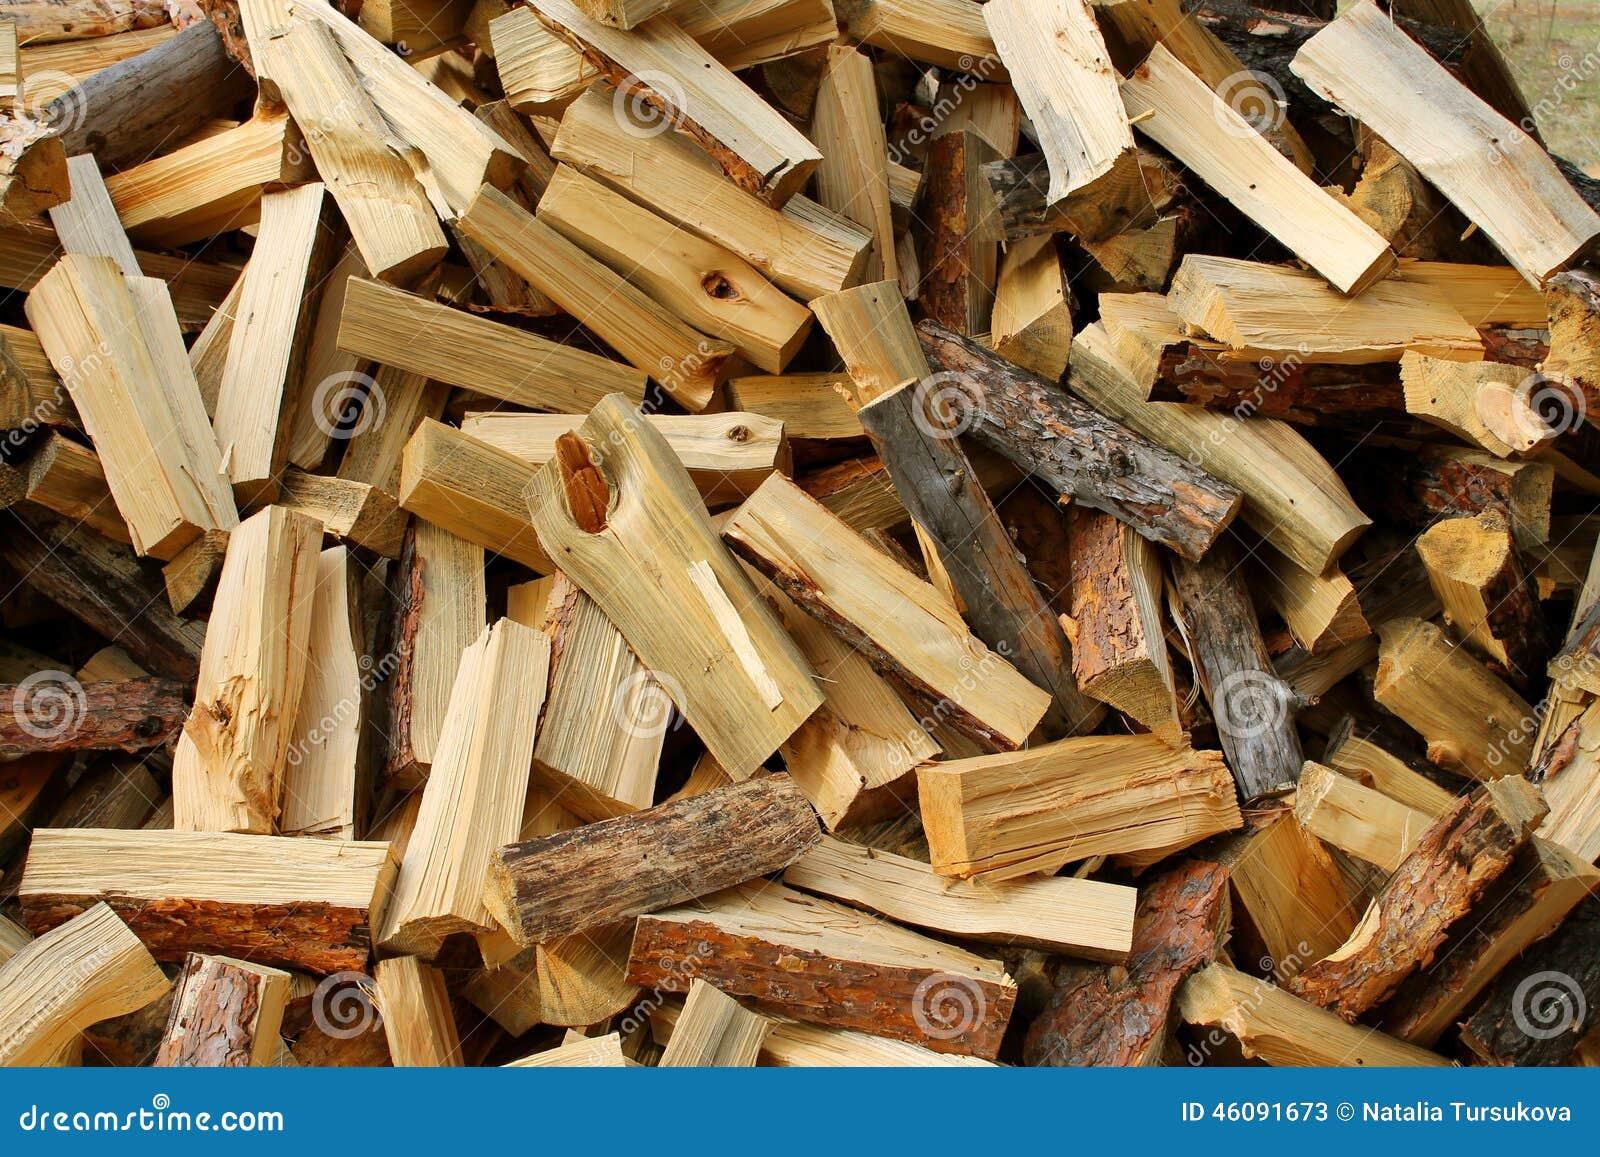 Bois de chauffage de pin photo stock image 46091673 - Bois de chauffage peuplier ...